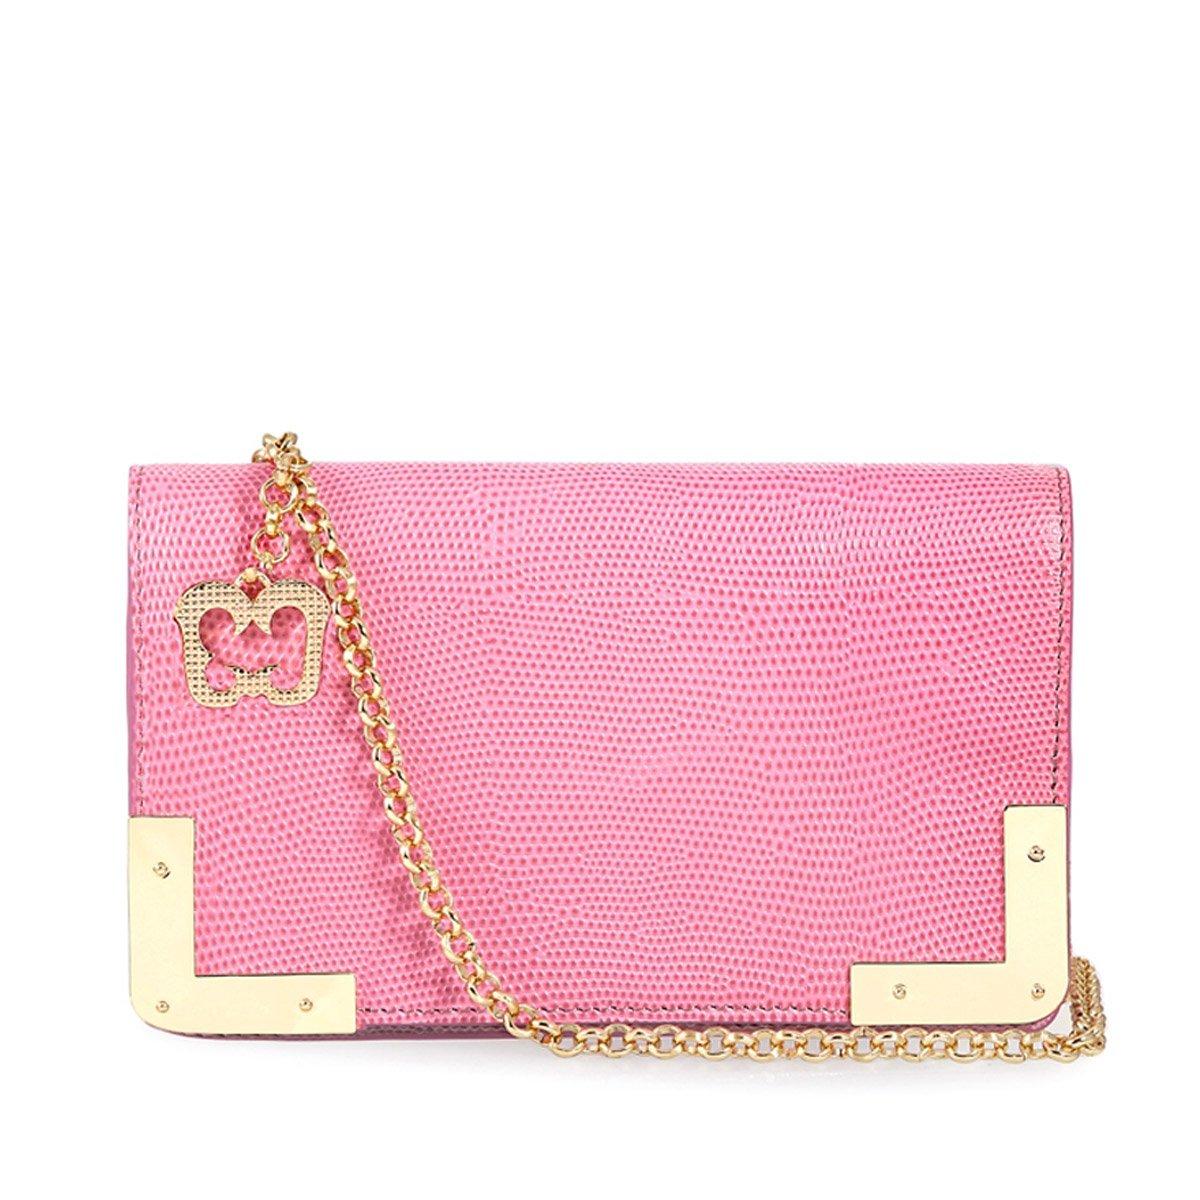 Eric Javits Luxury Fashion Designer Women's Handbag - Cassidy - Pink Mix